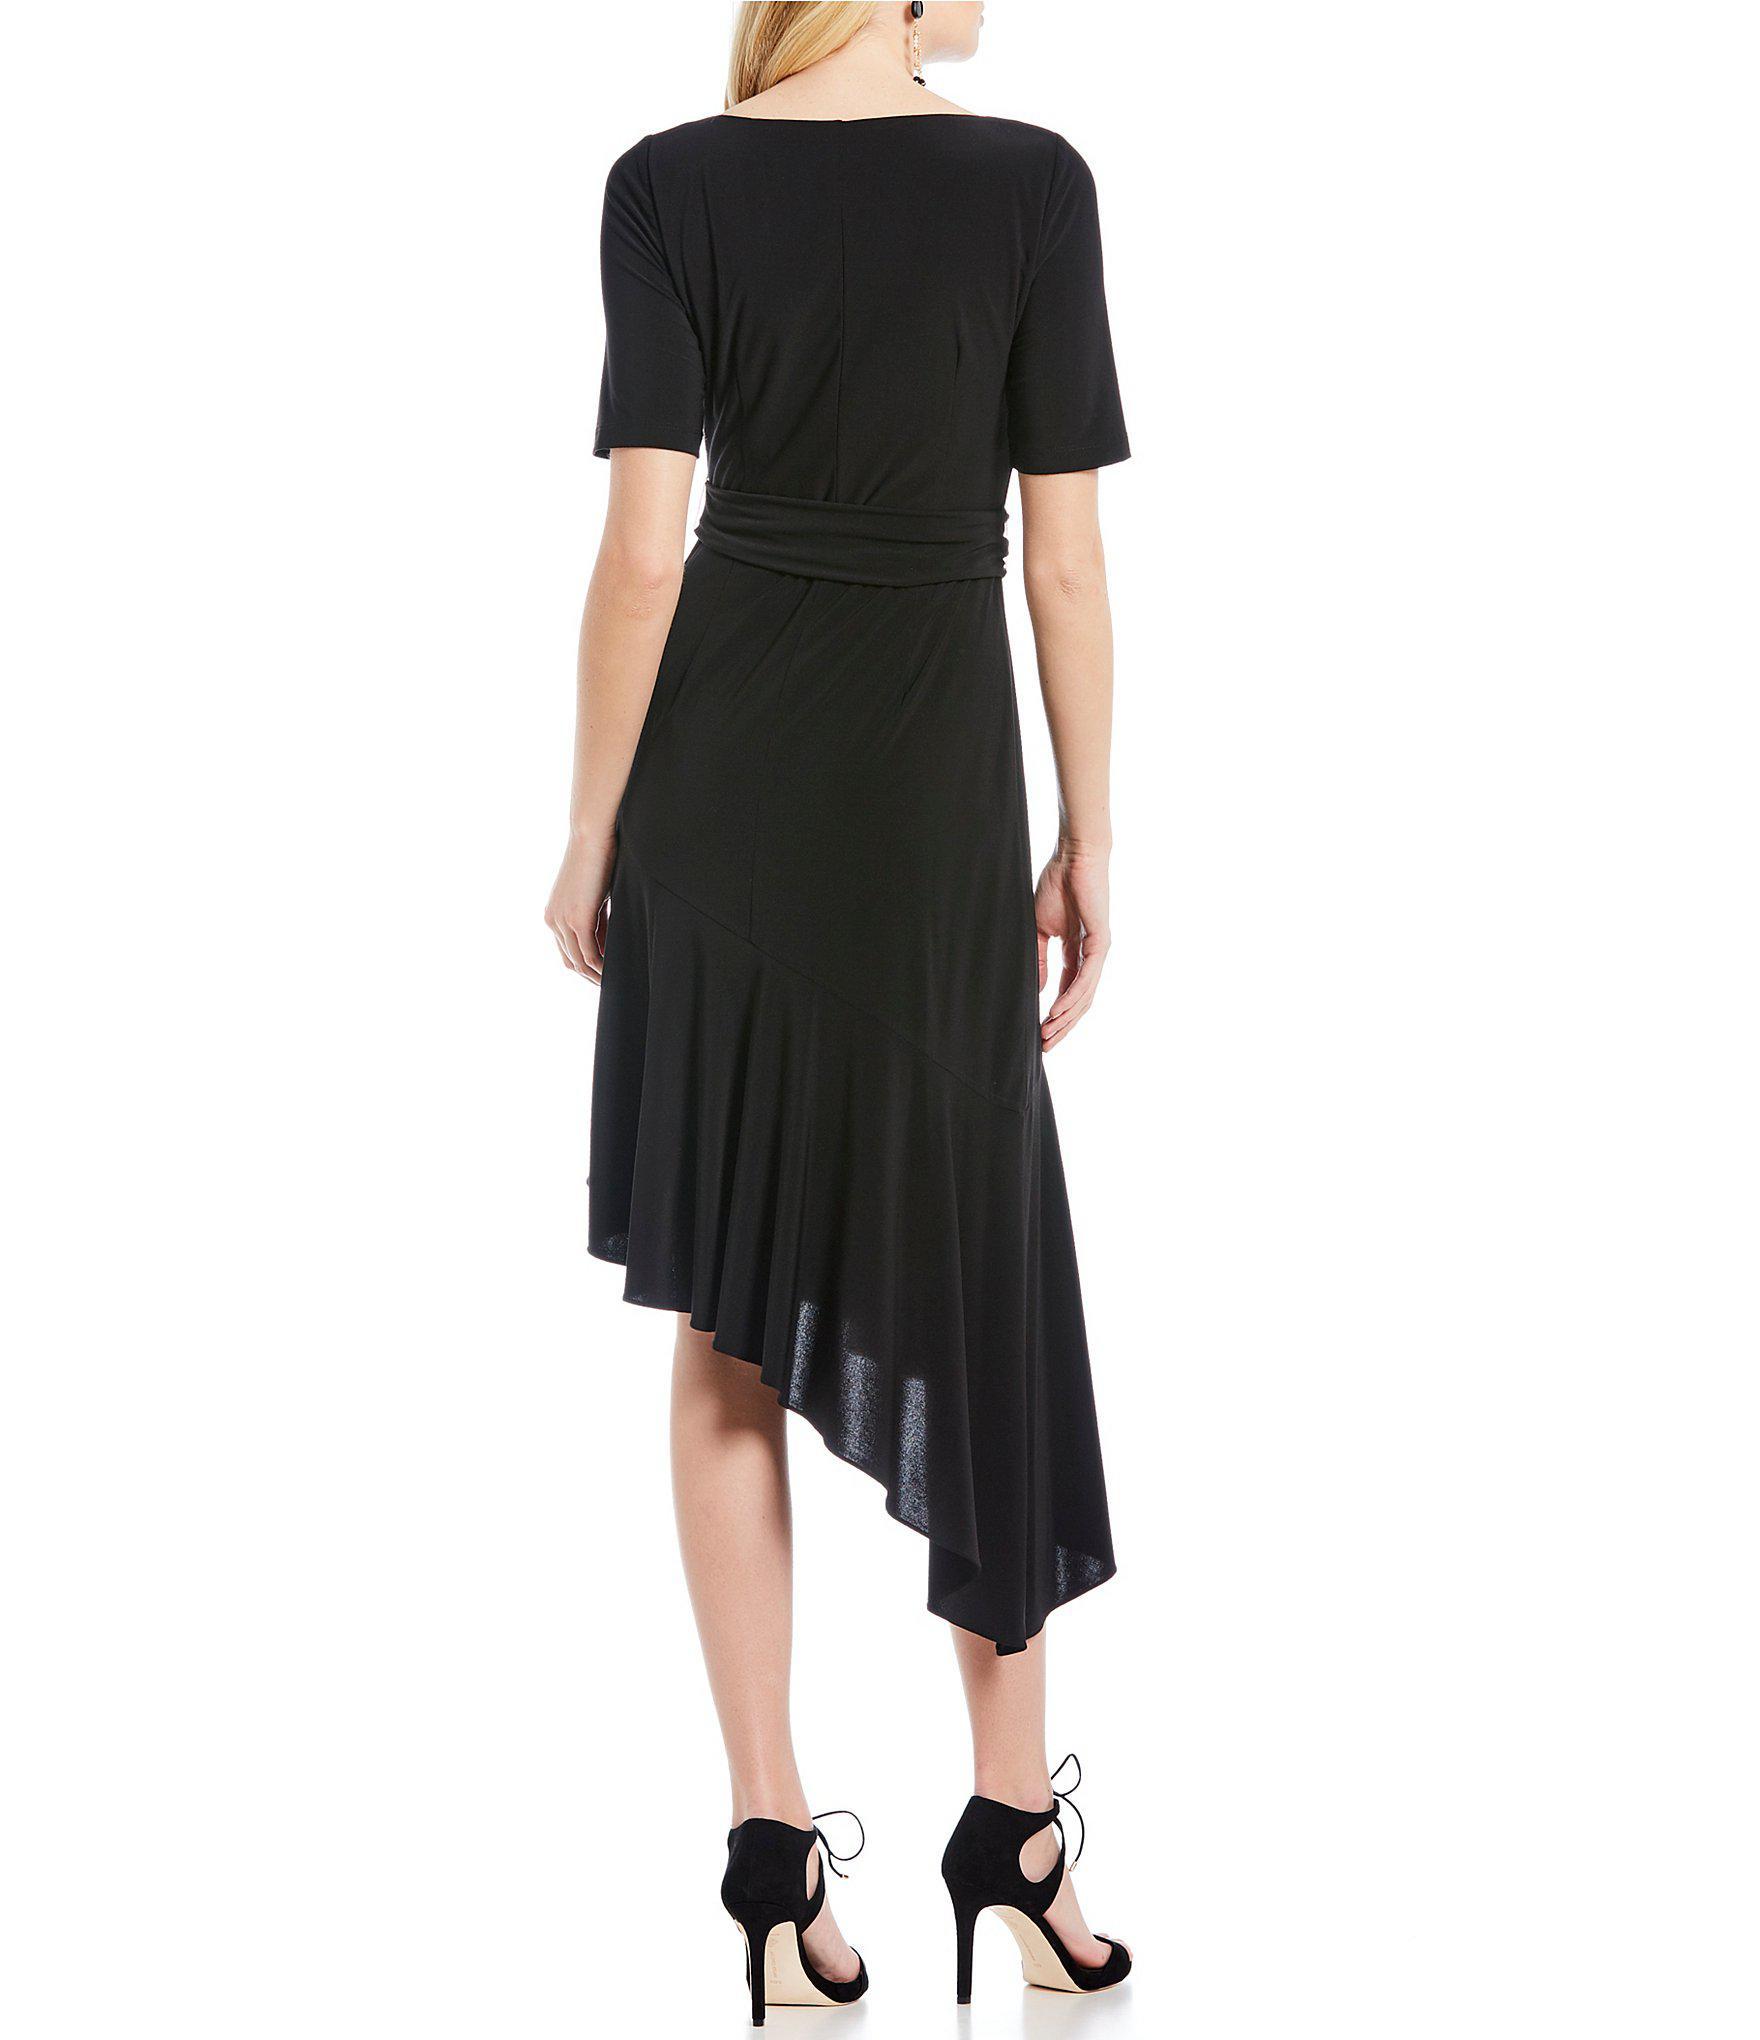 df17f7c82567 Adrianna Papell - Black Asymmetrical Ruffle Tie Front Jersey Dress - Lyst.  View fullscreen